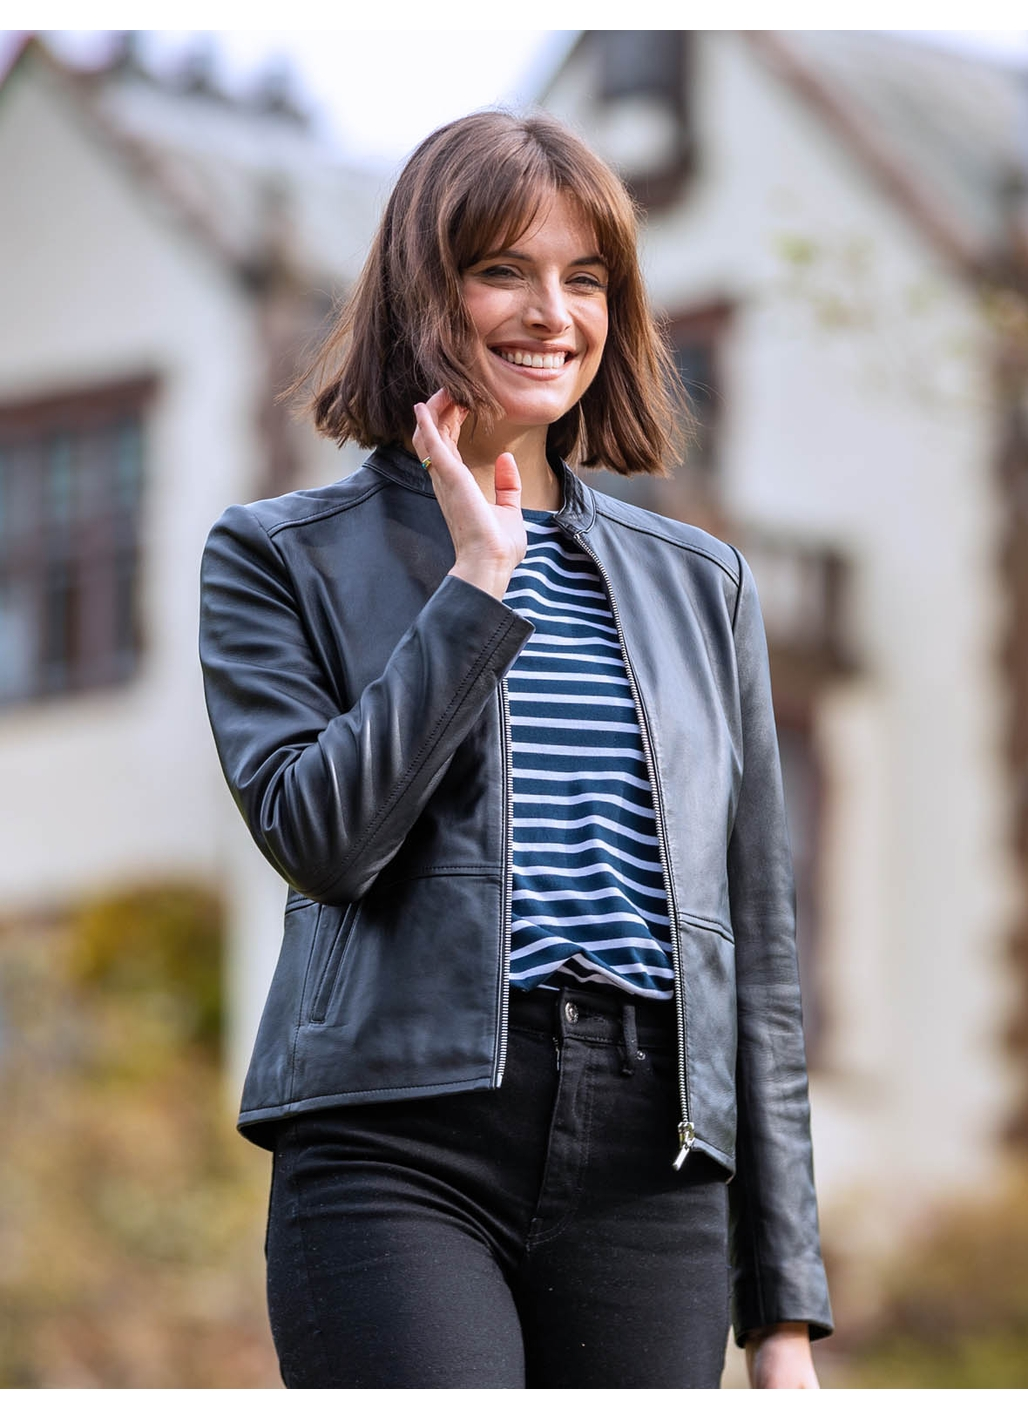 Lingmoor Leather Jacket in Black